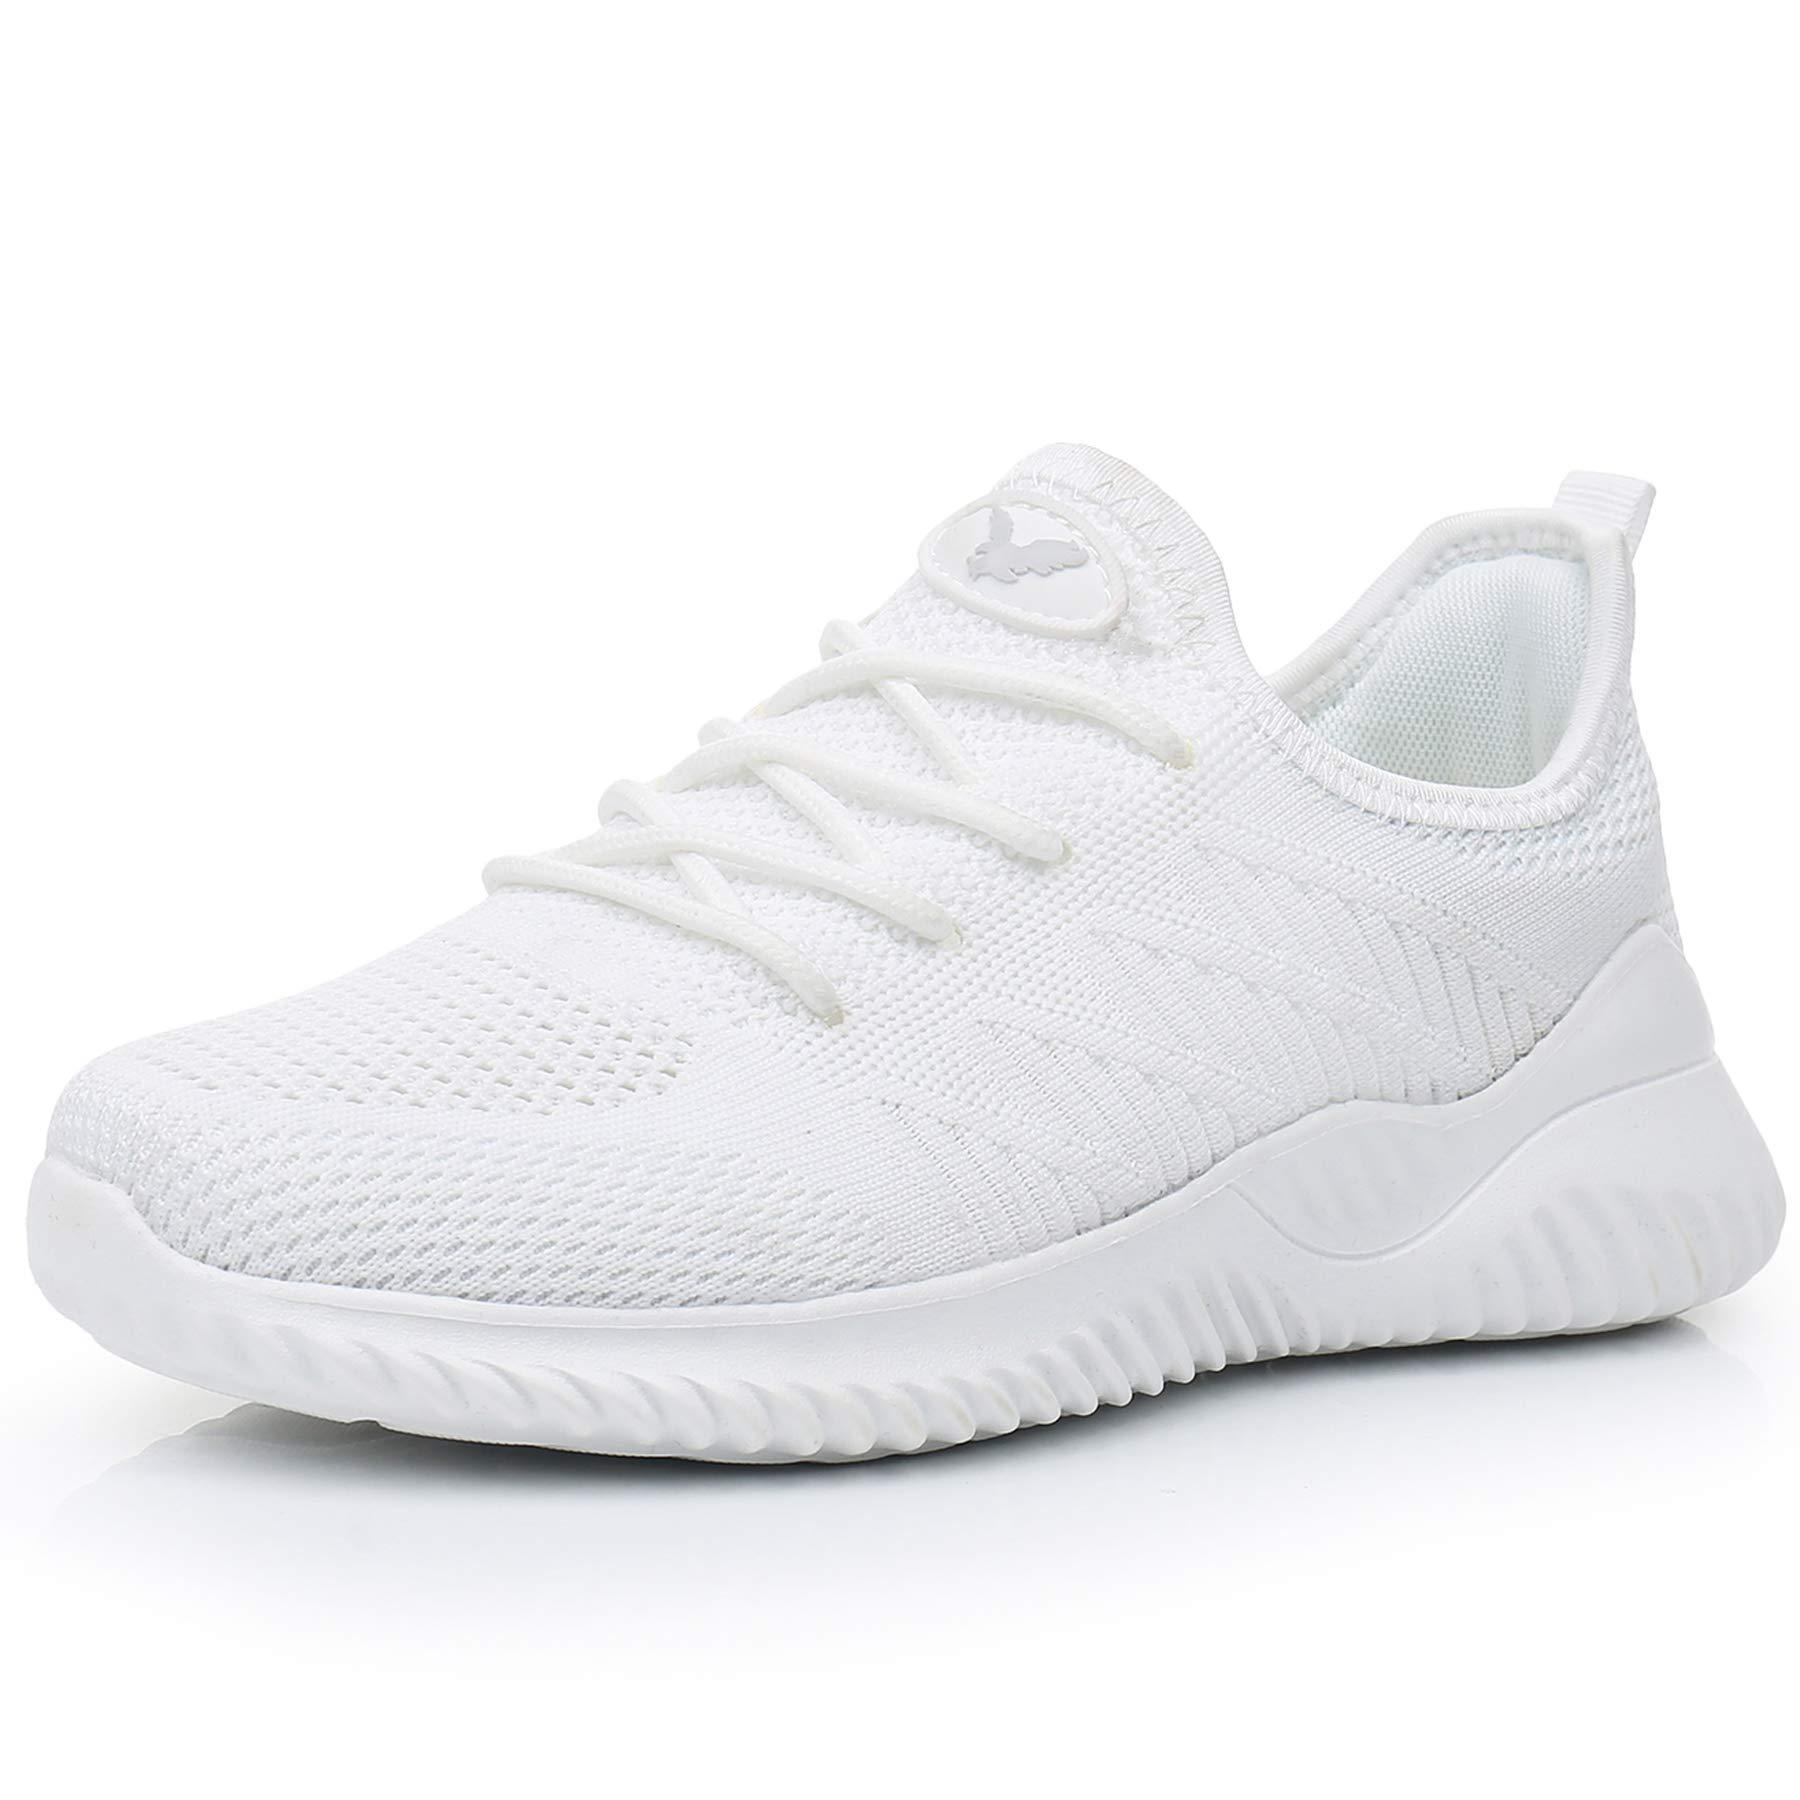 JARLIF Women's Memory Foam Slip On Walking Tennis Shoes Lightweight Gym Jogging Sports Athletic Running Sneakers US5.5-10